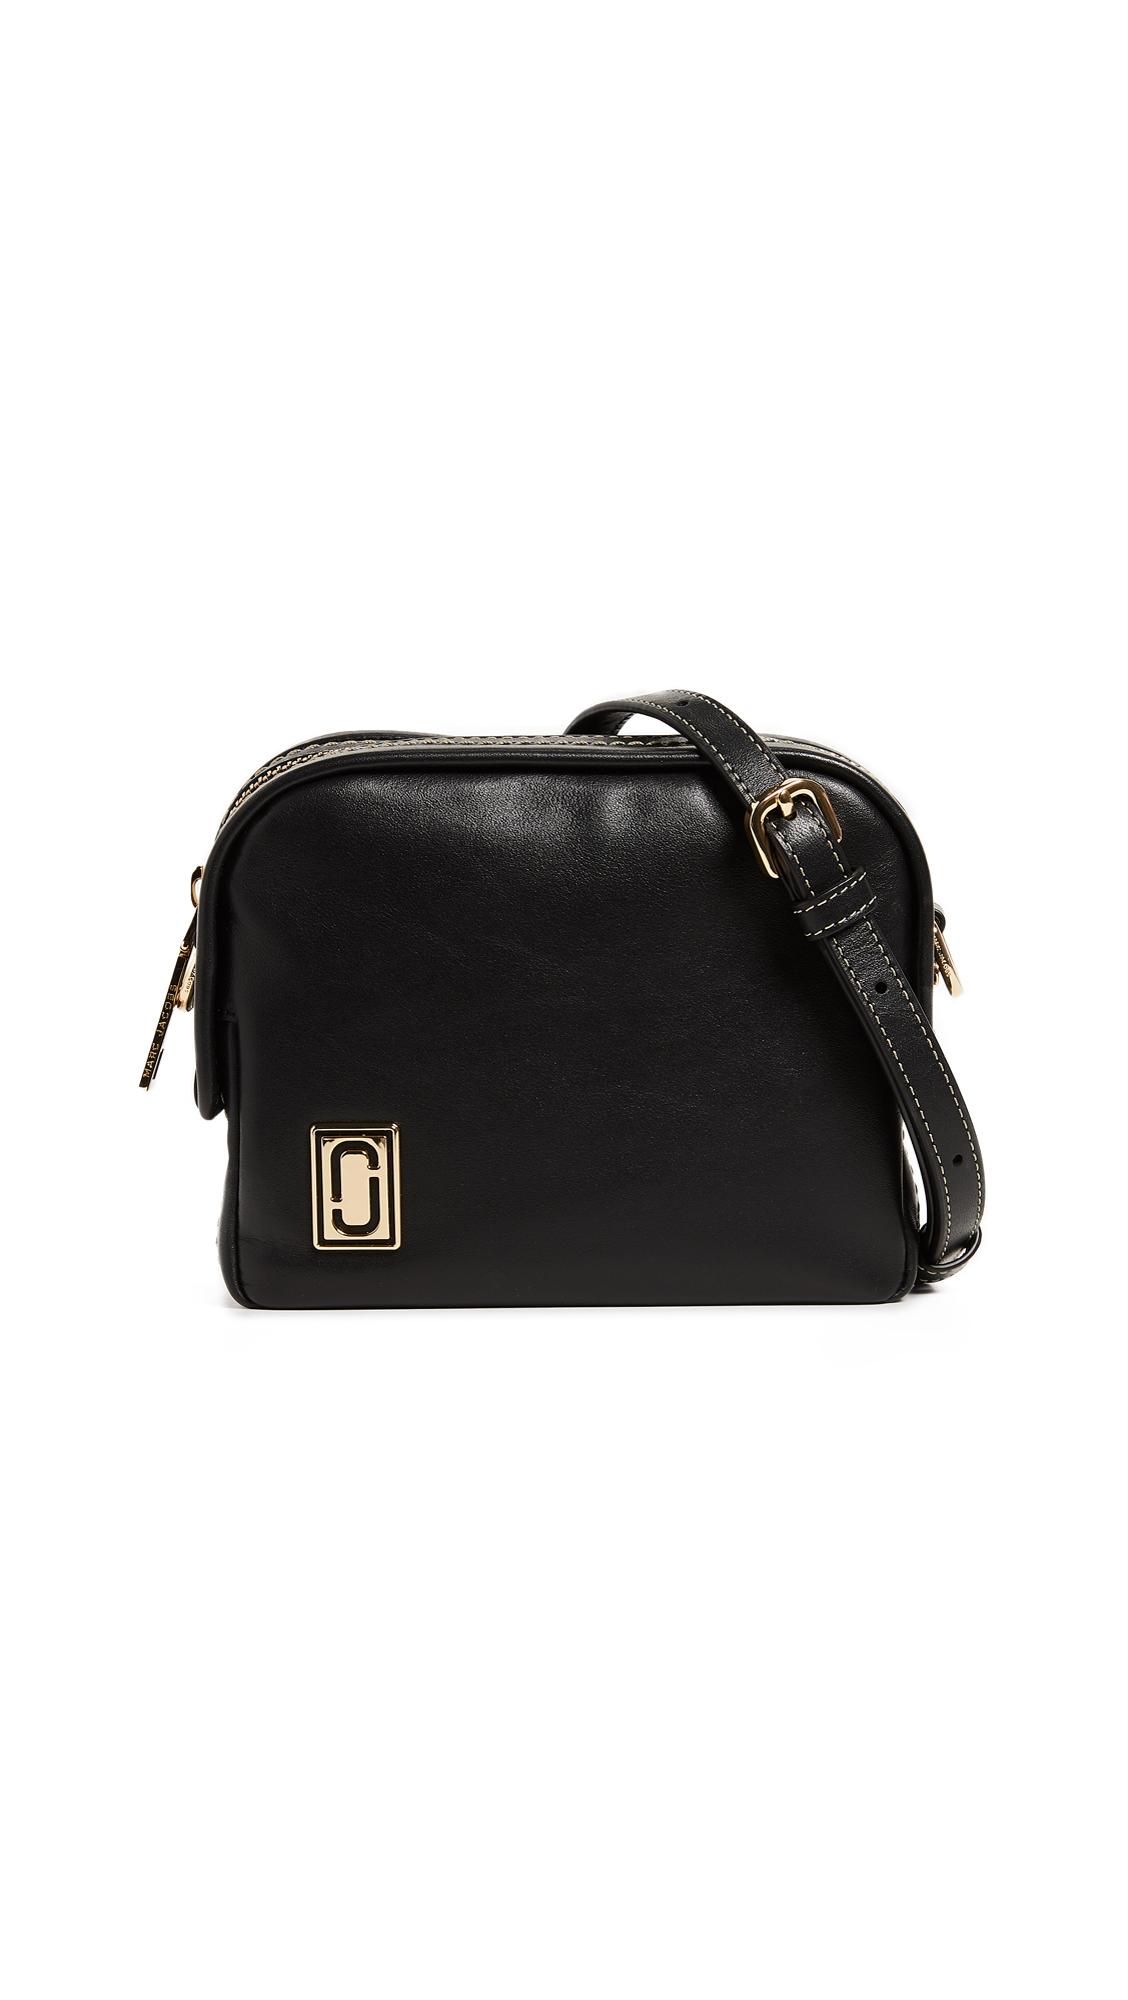 Marc Jacobs Mini Squeeze Bag - Black